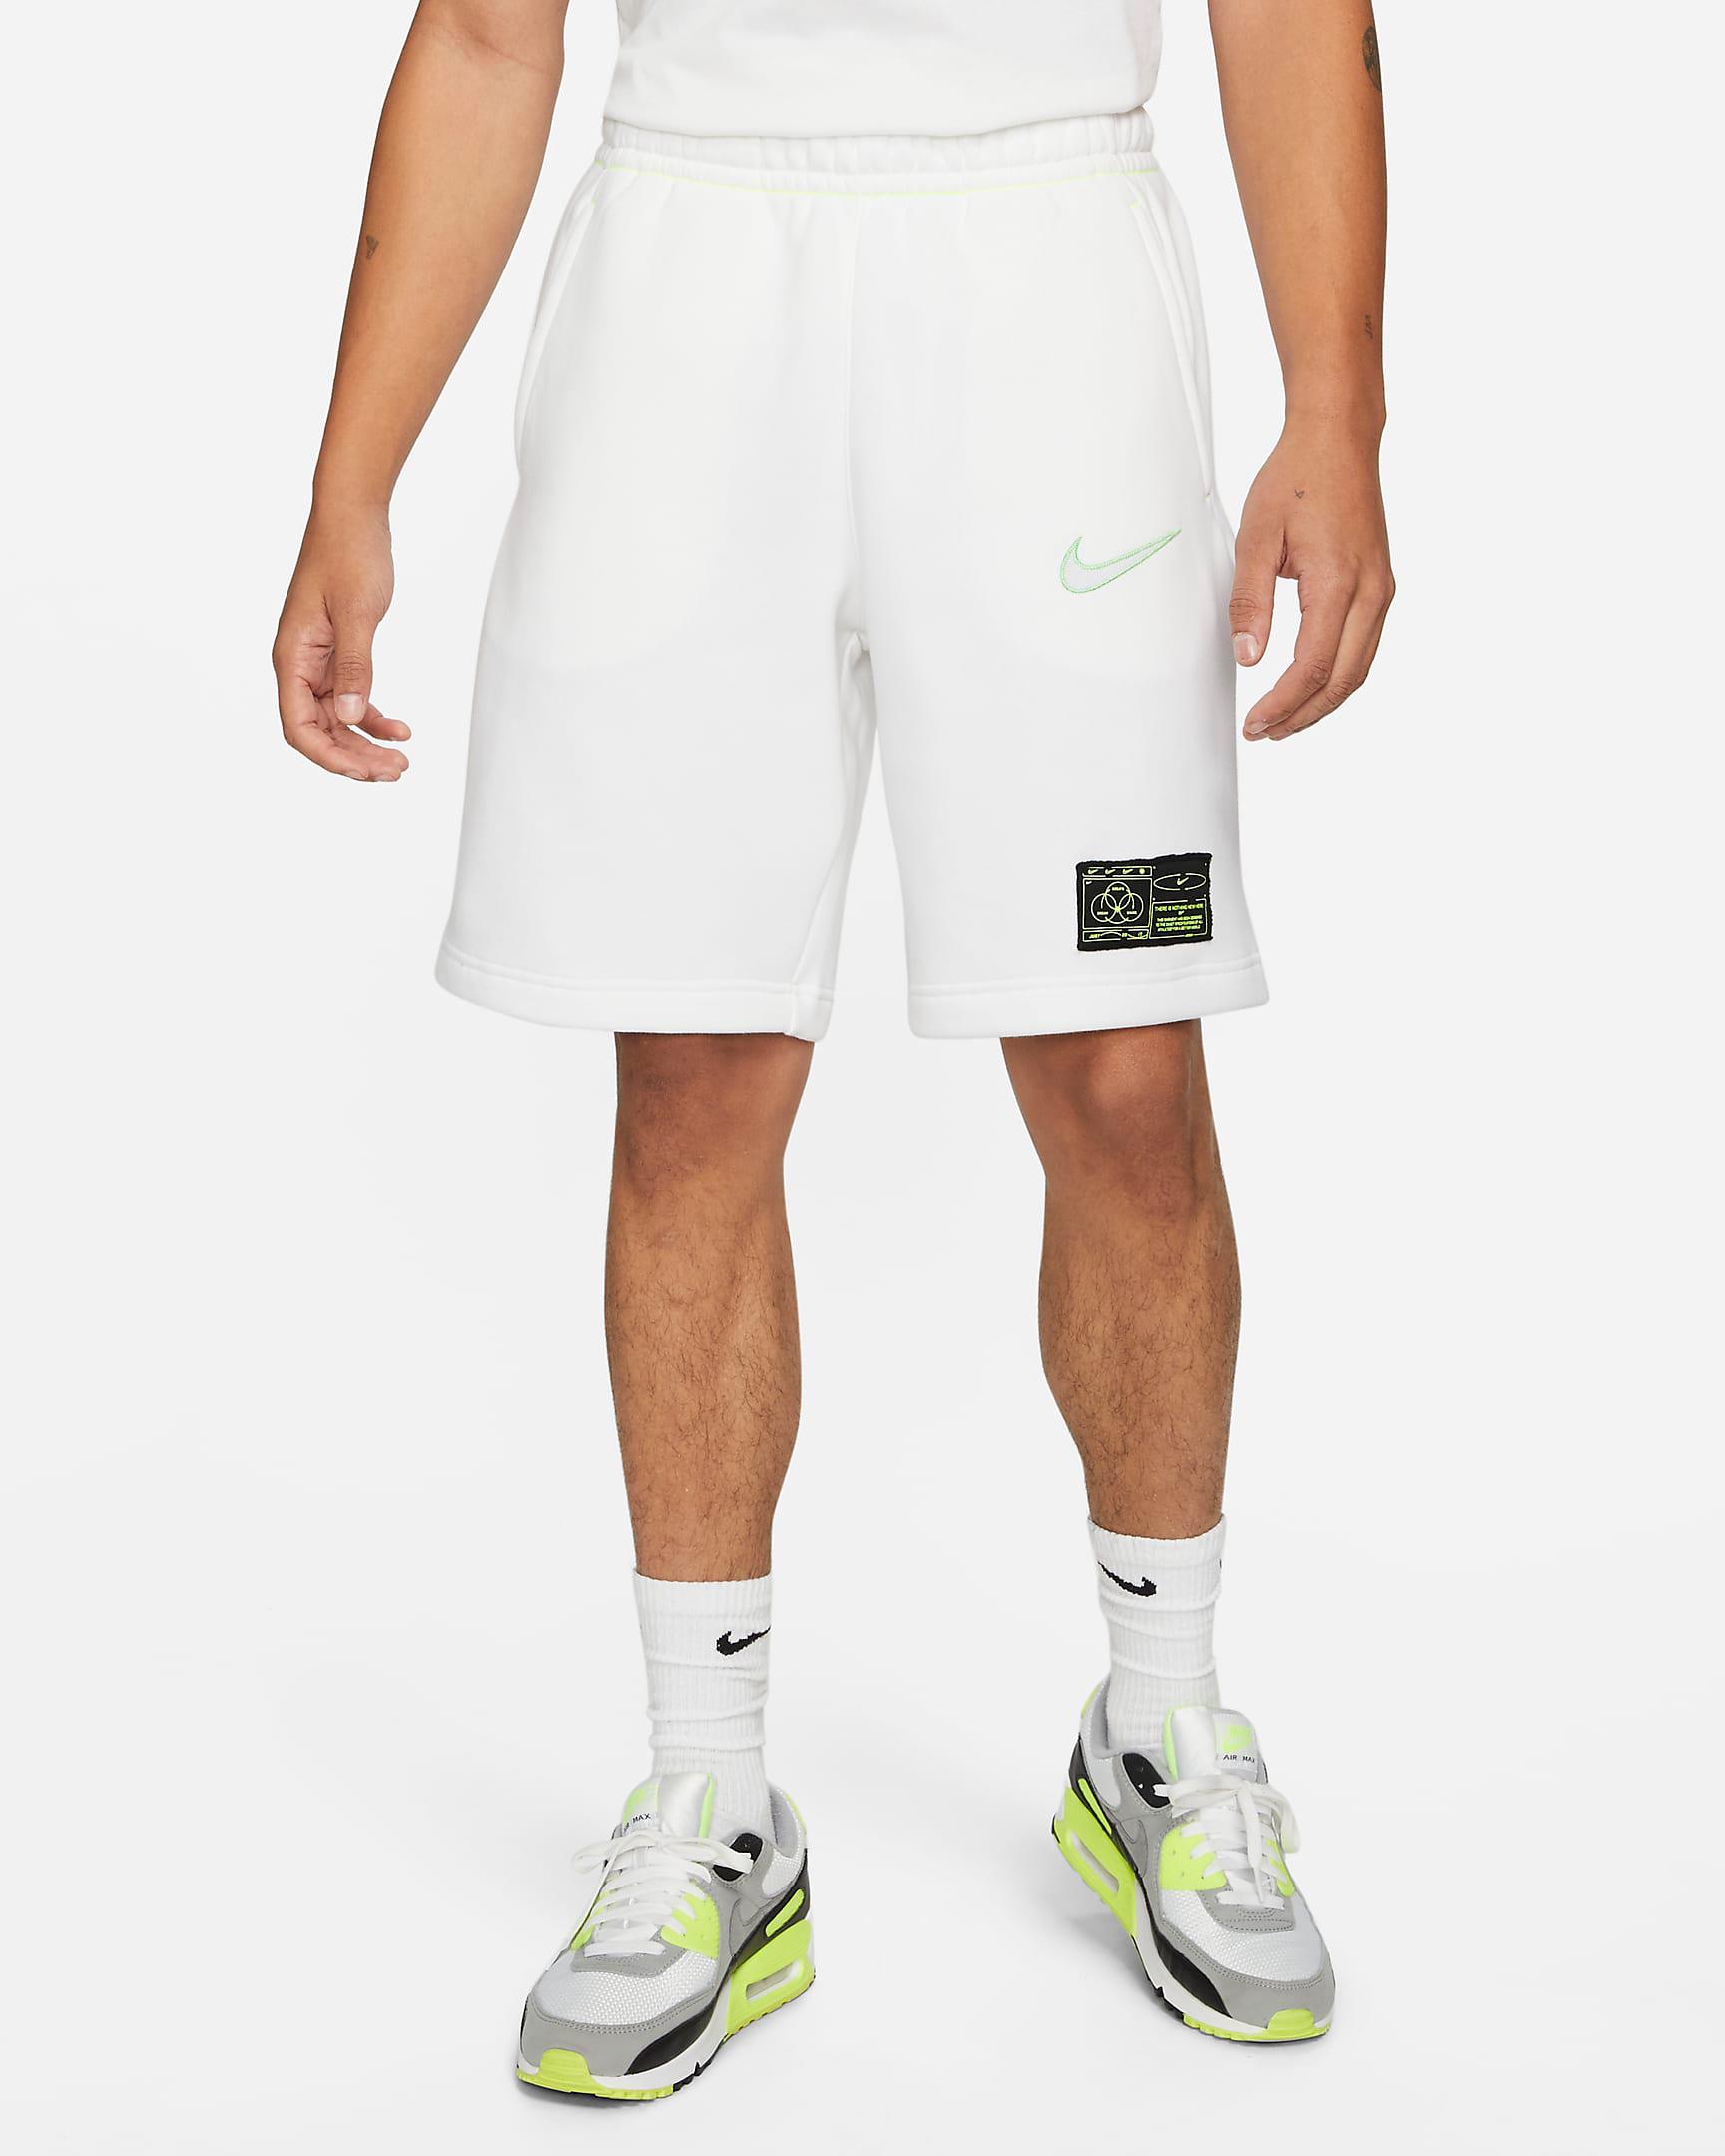 nike-club-fleece-shorts-white-volt-1